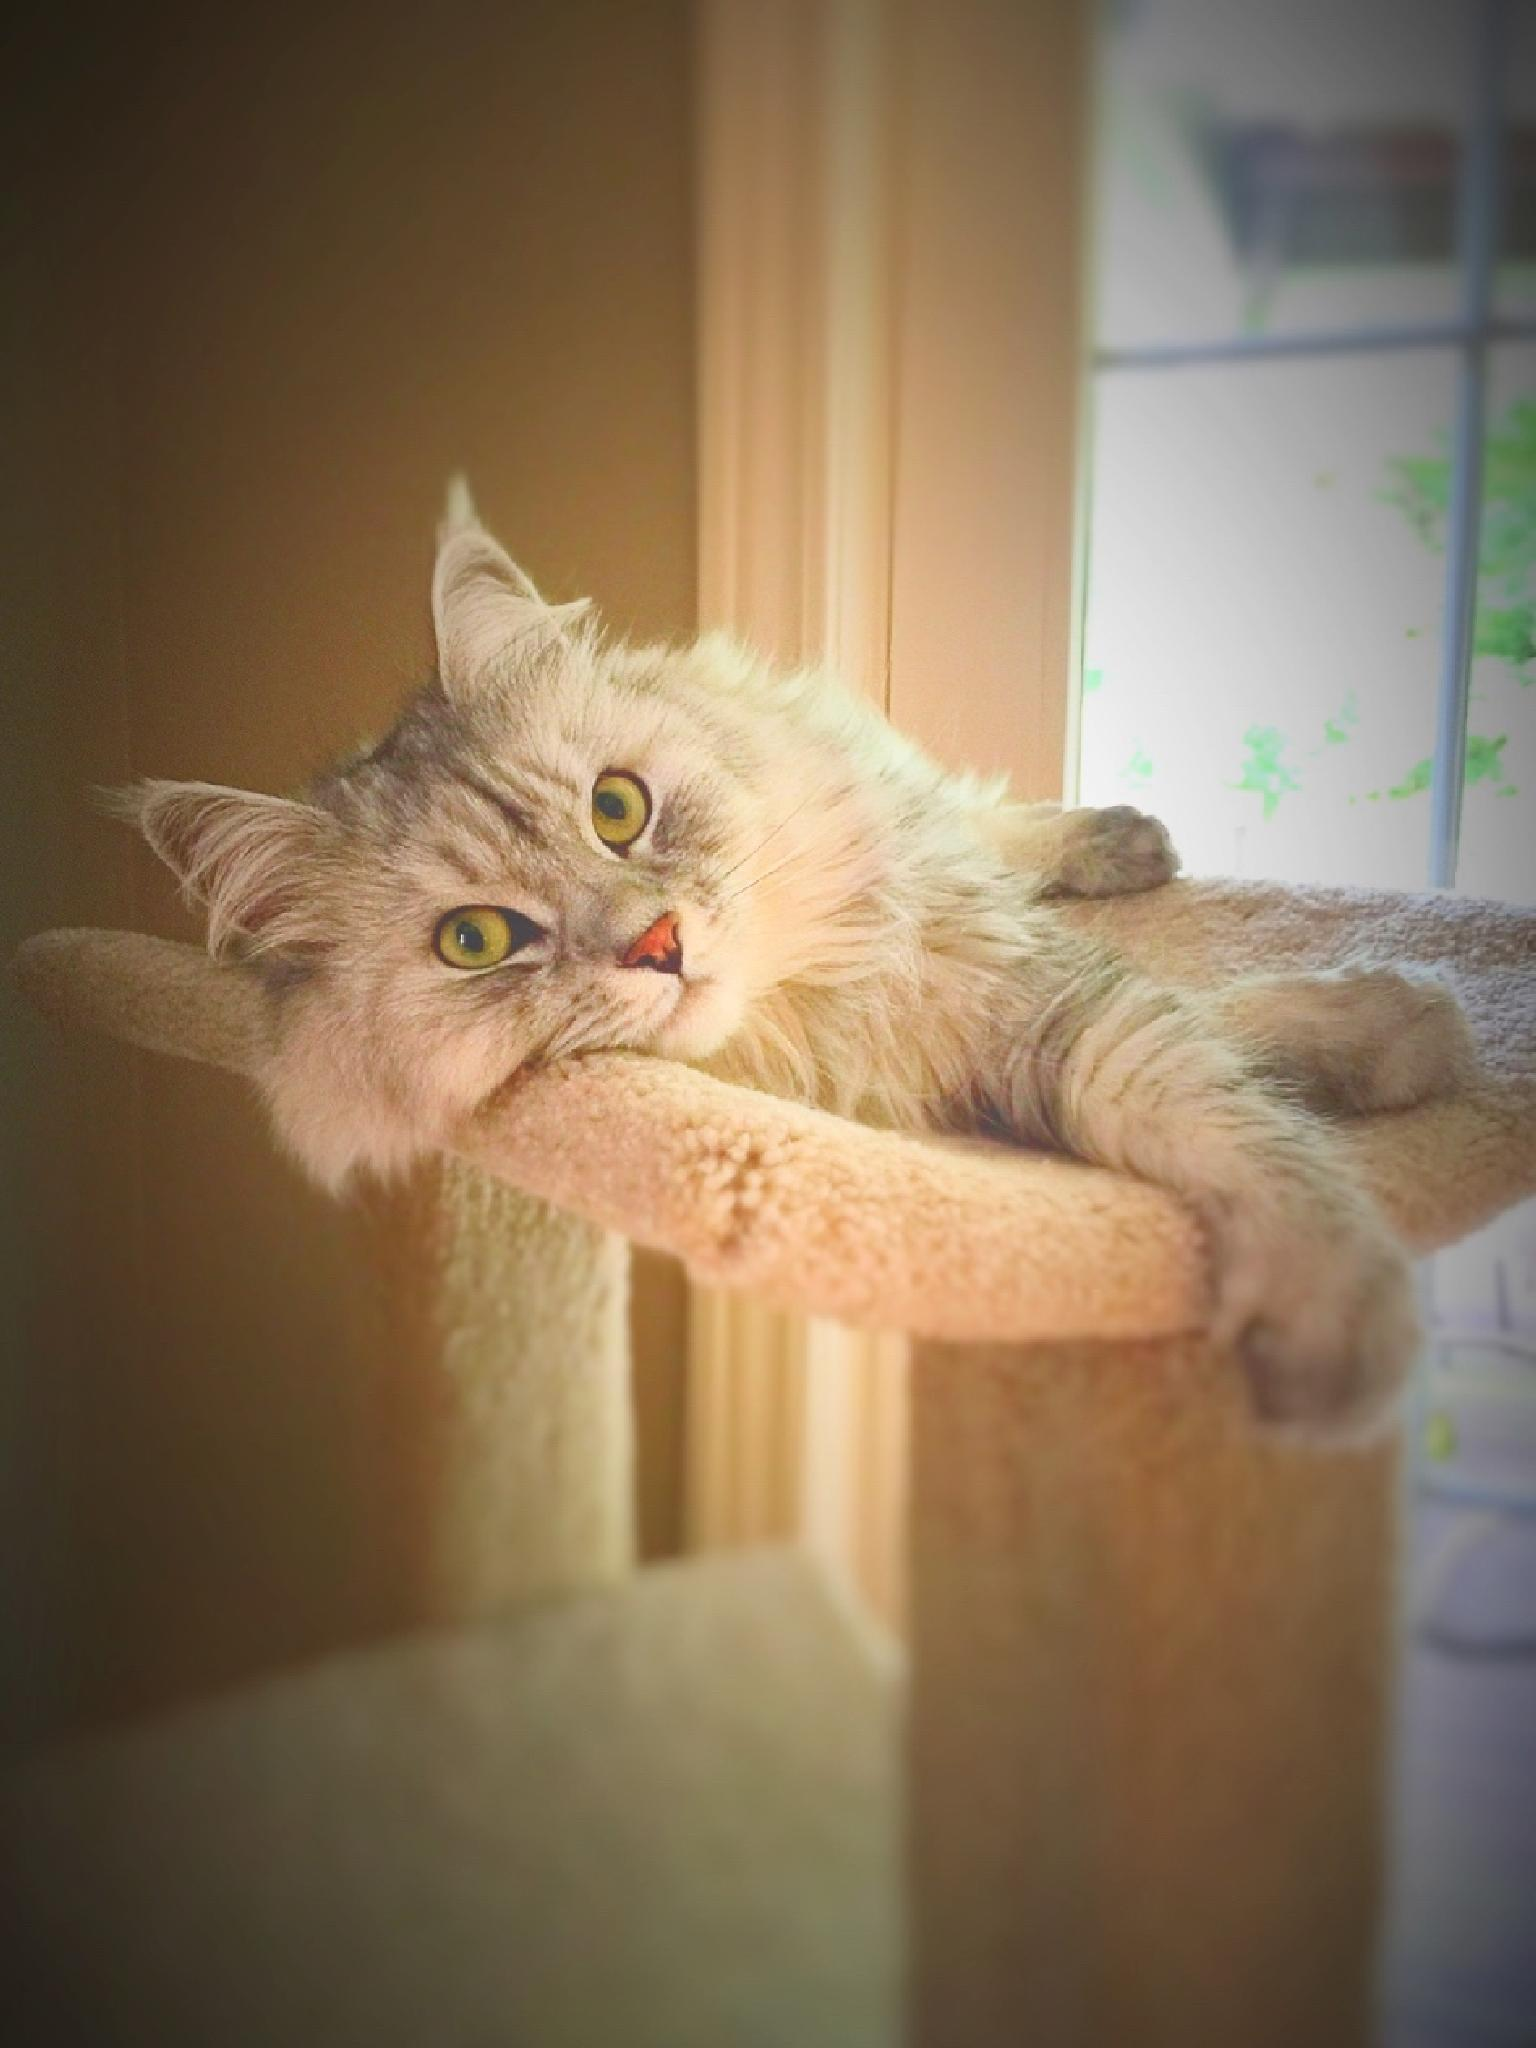 It's a Cat's Life by Susan Wood